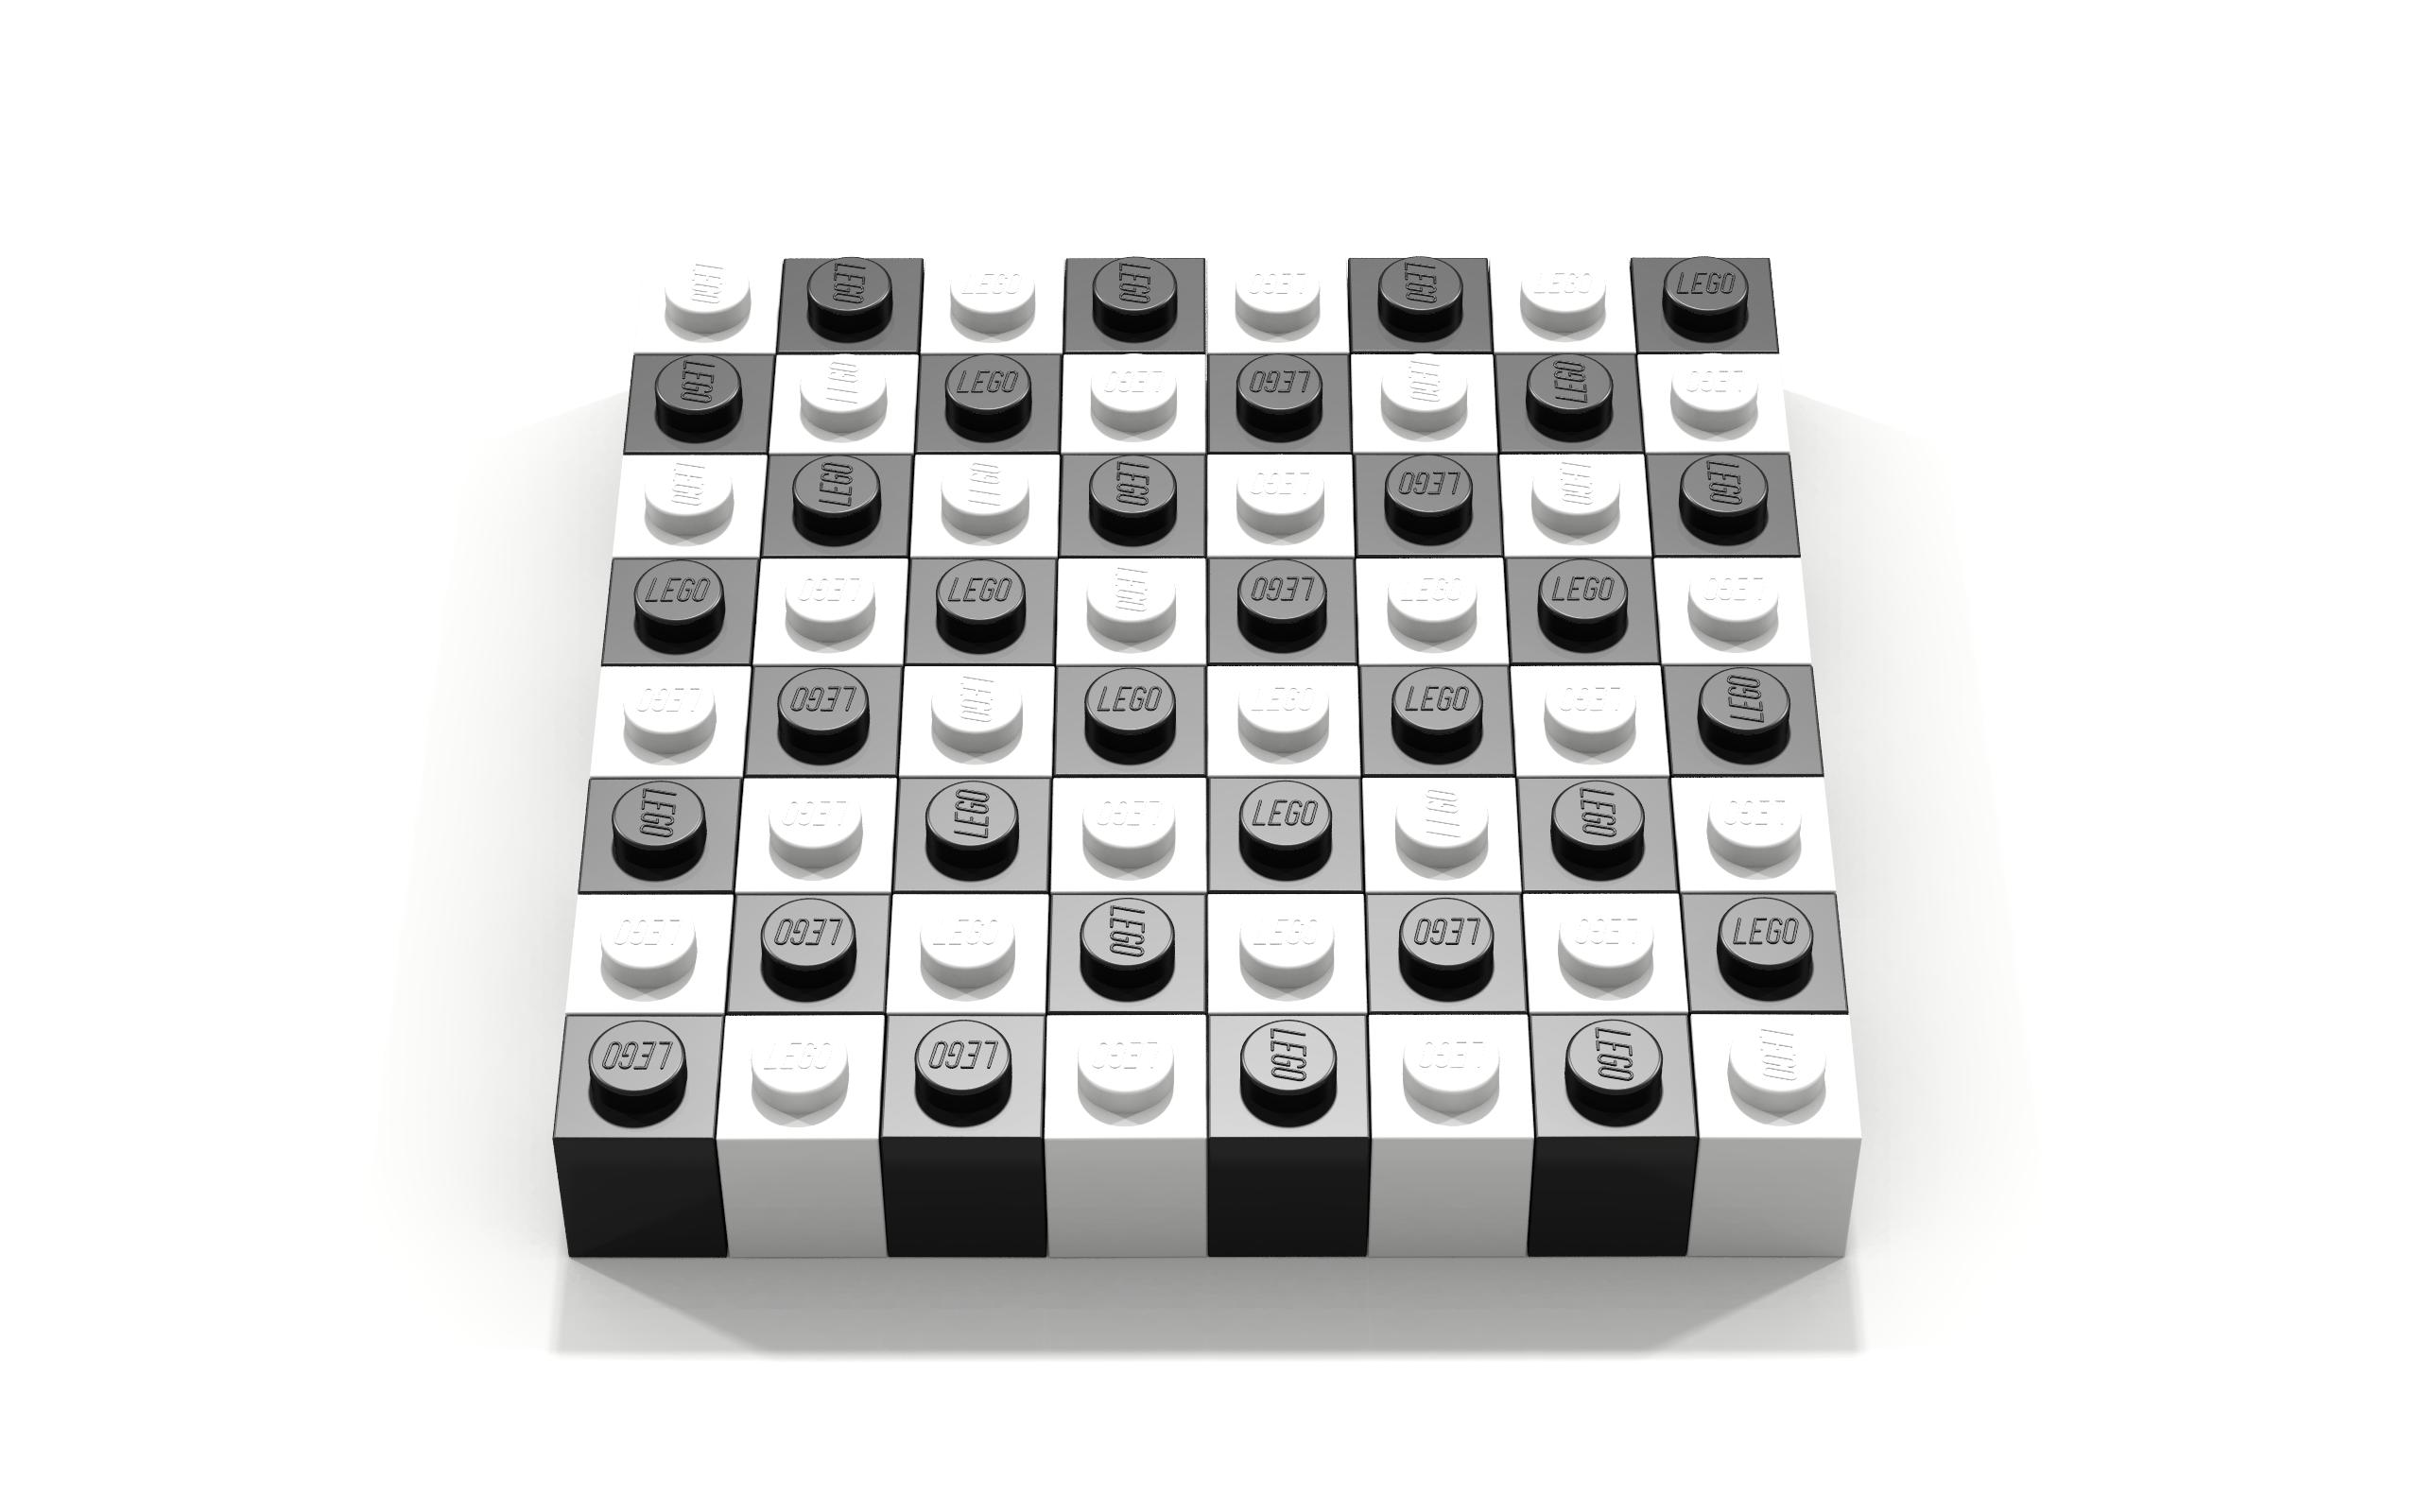 level-5-ca-chessboard01